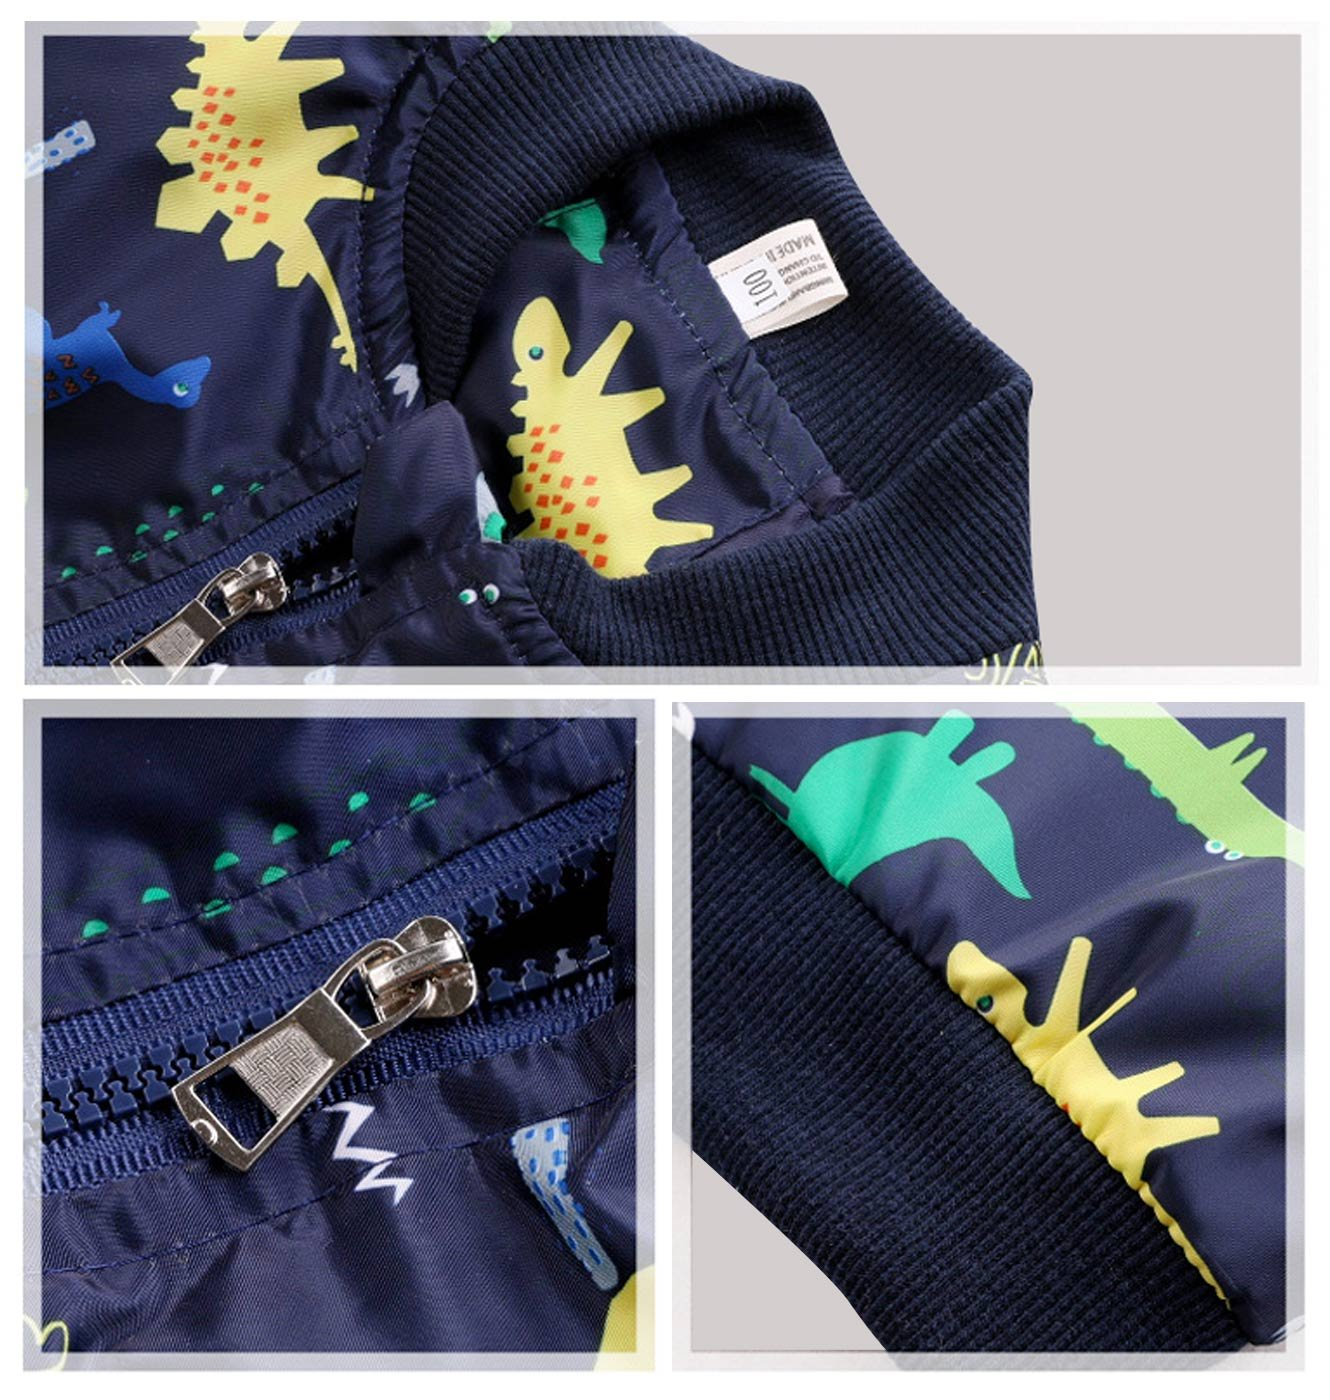 HARVEY JIA - Chaqueta Corto Niño Niña Otoño Primavera con Estampado Dinosaurio Transpirable Suave Abrigo Niña Bebé… 4